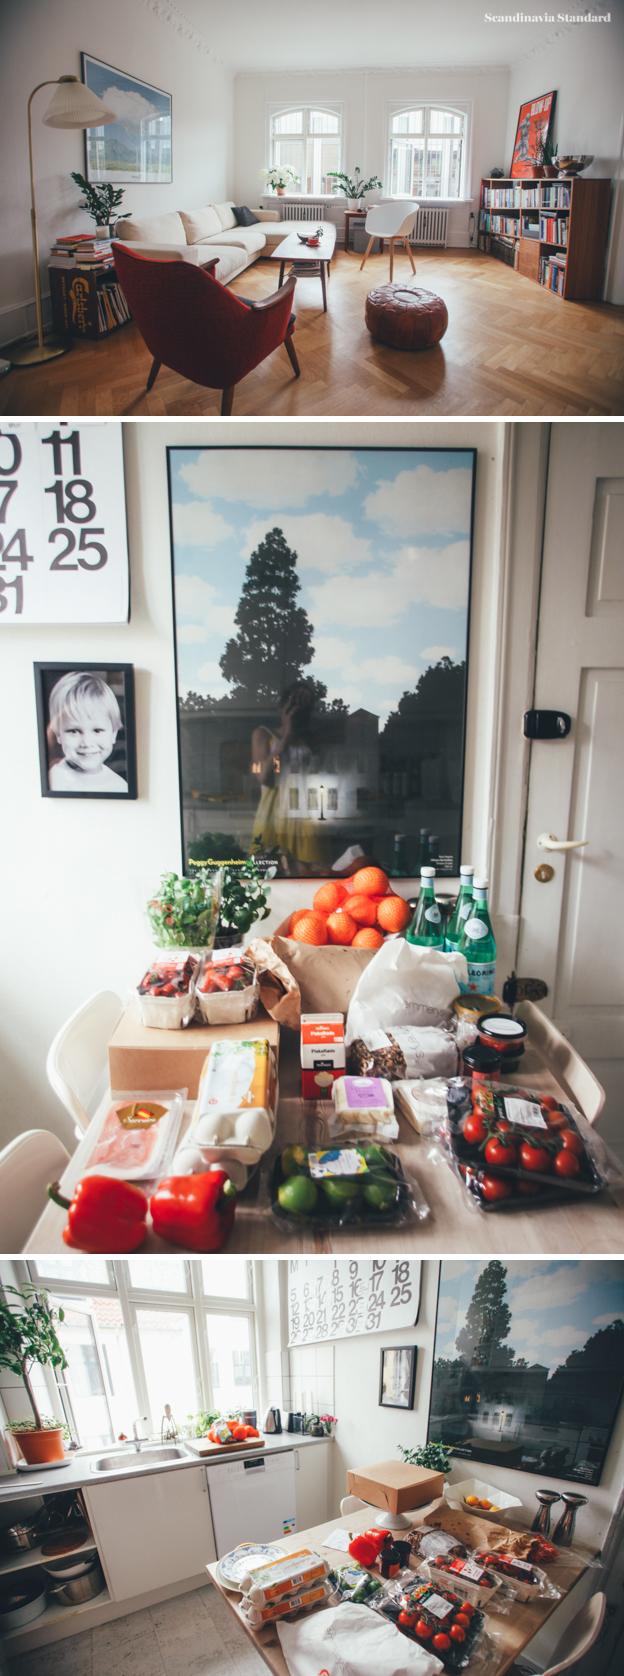 1. Danish Brunch Prep | Scandinavia Standard